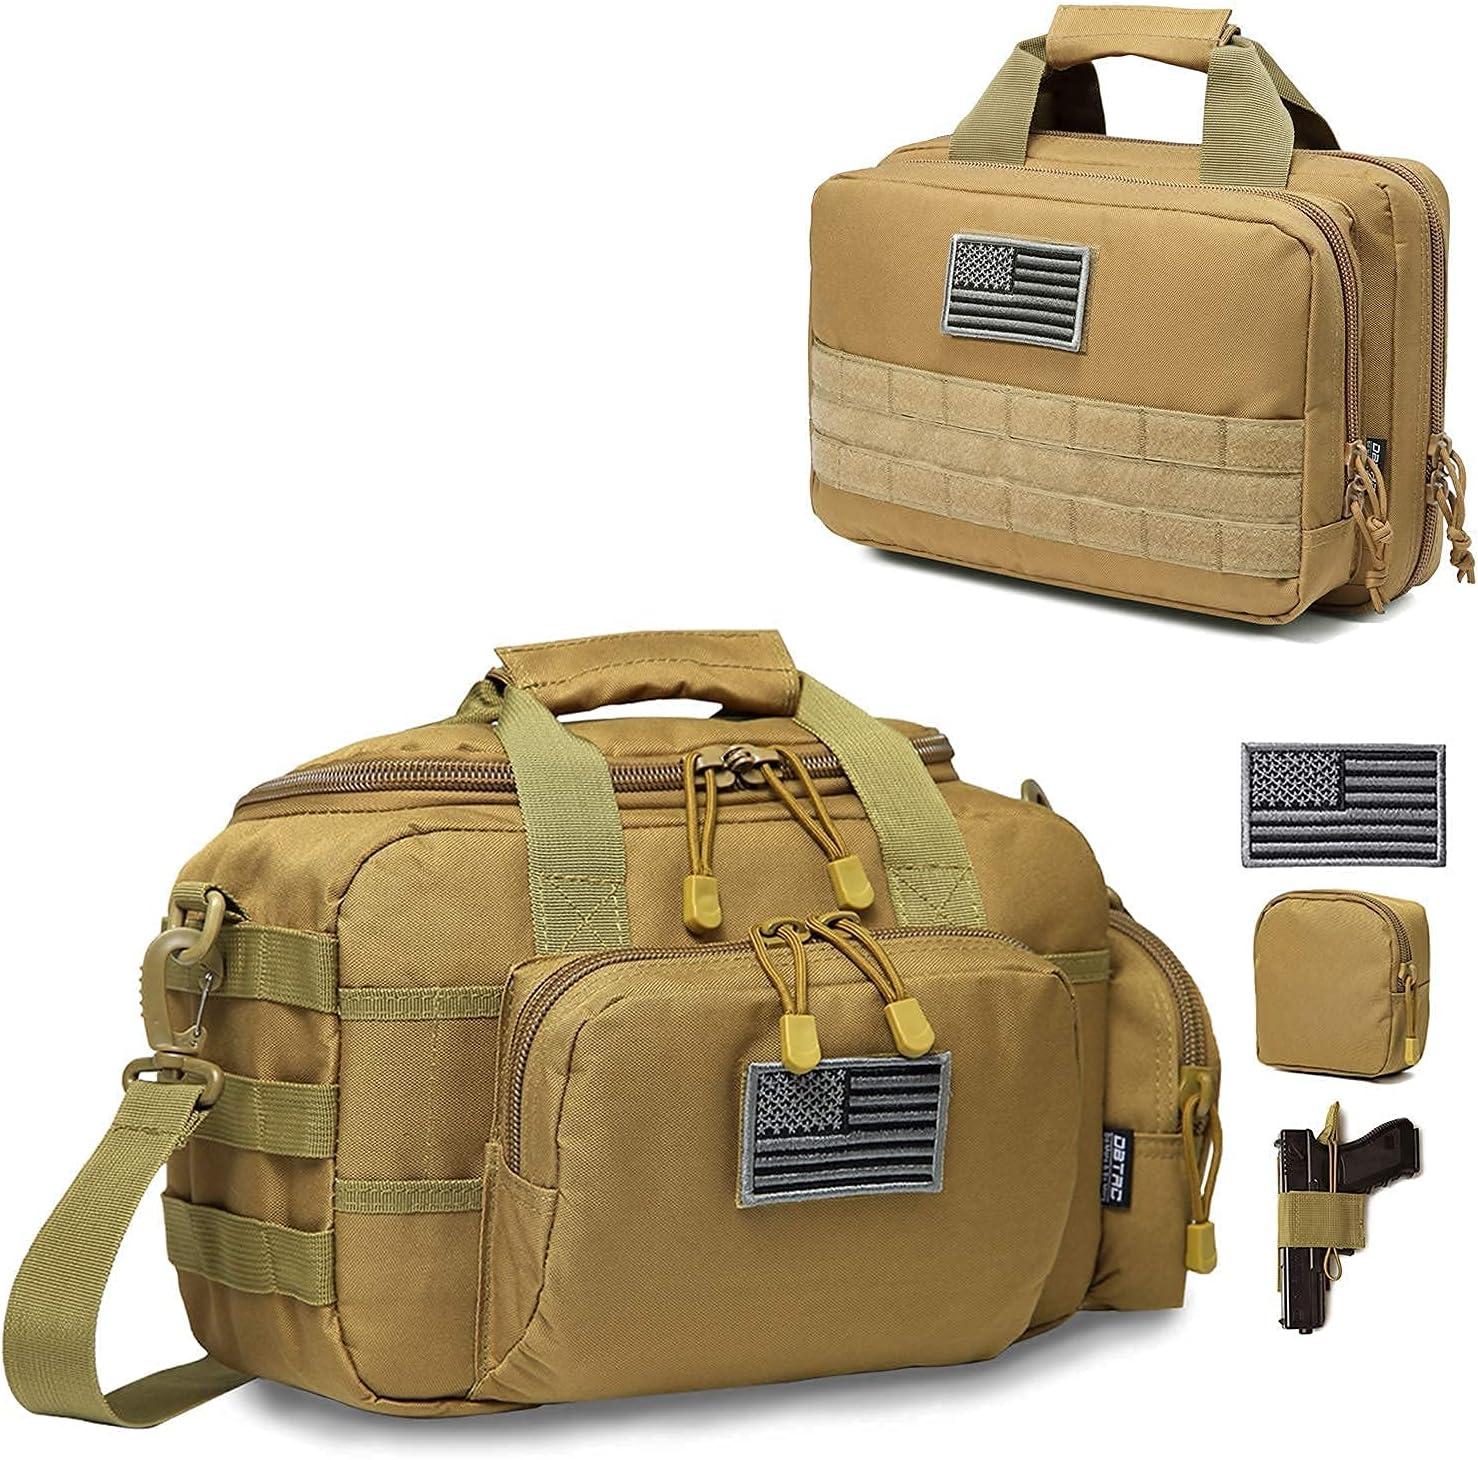 DBTAC Range Bag Small for 2X shop fo + Now on sale XS Tan Handbag Pistol